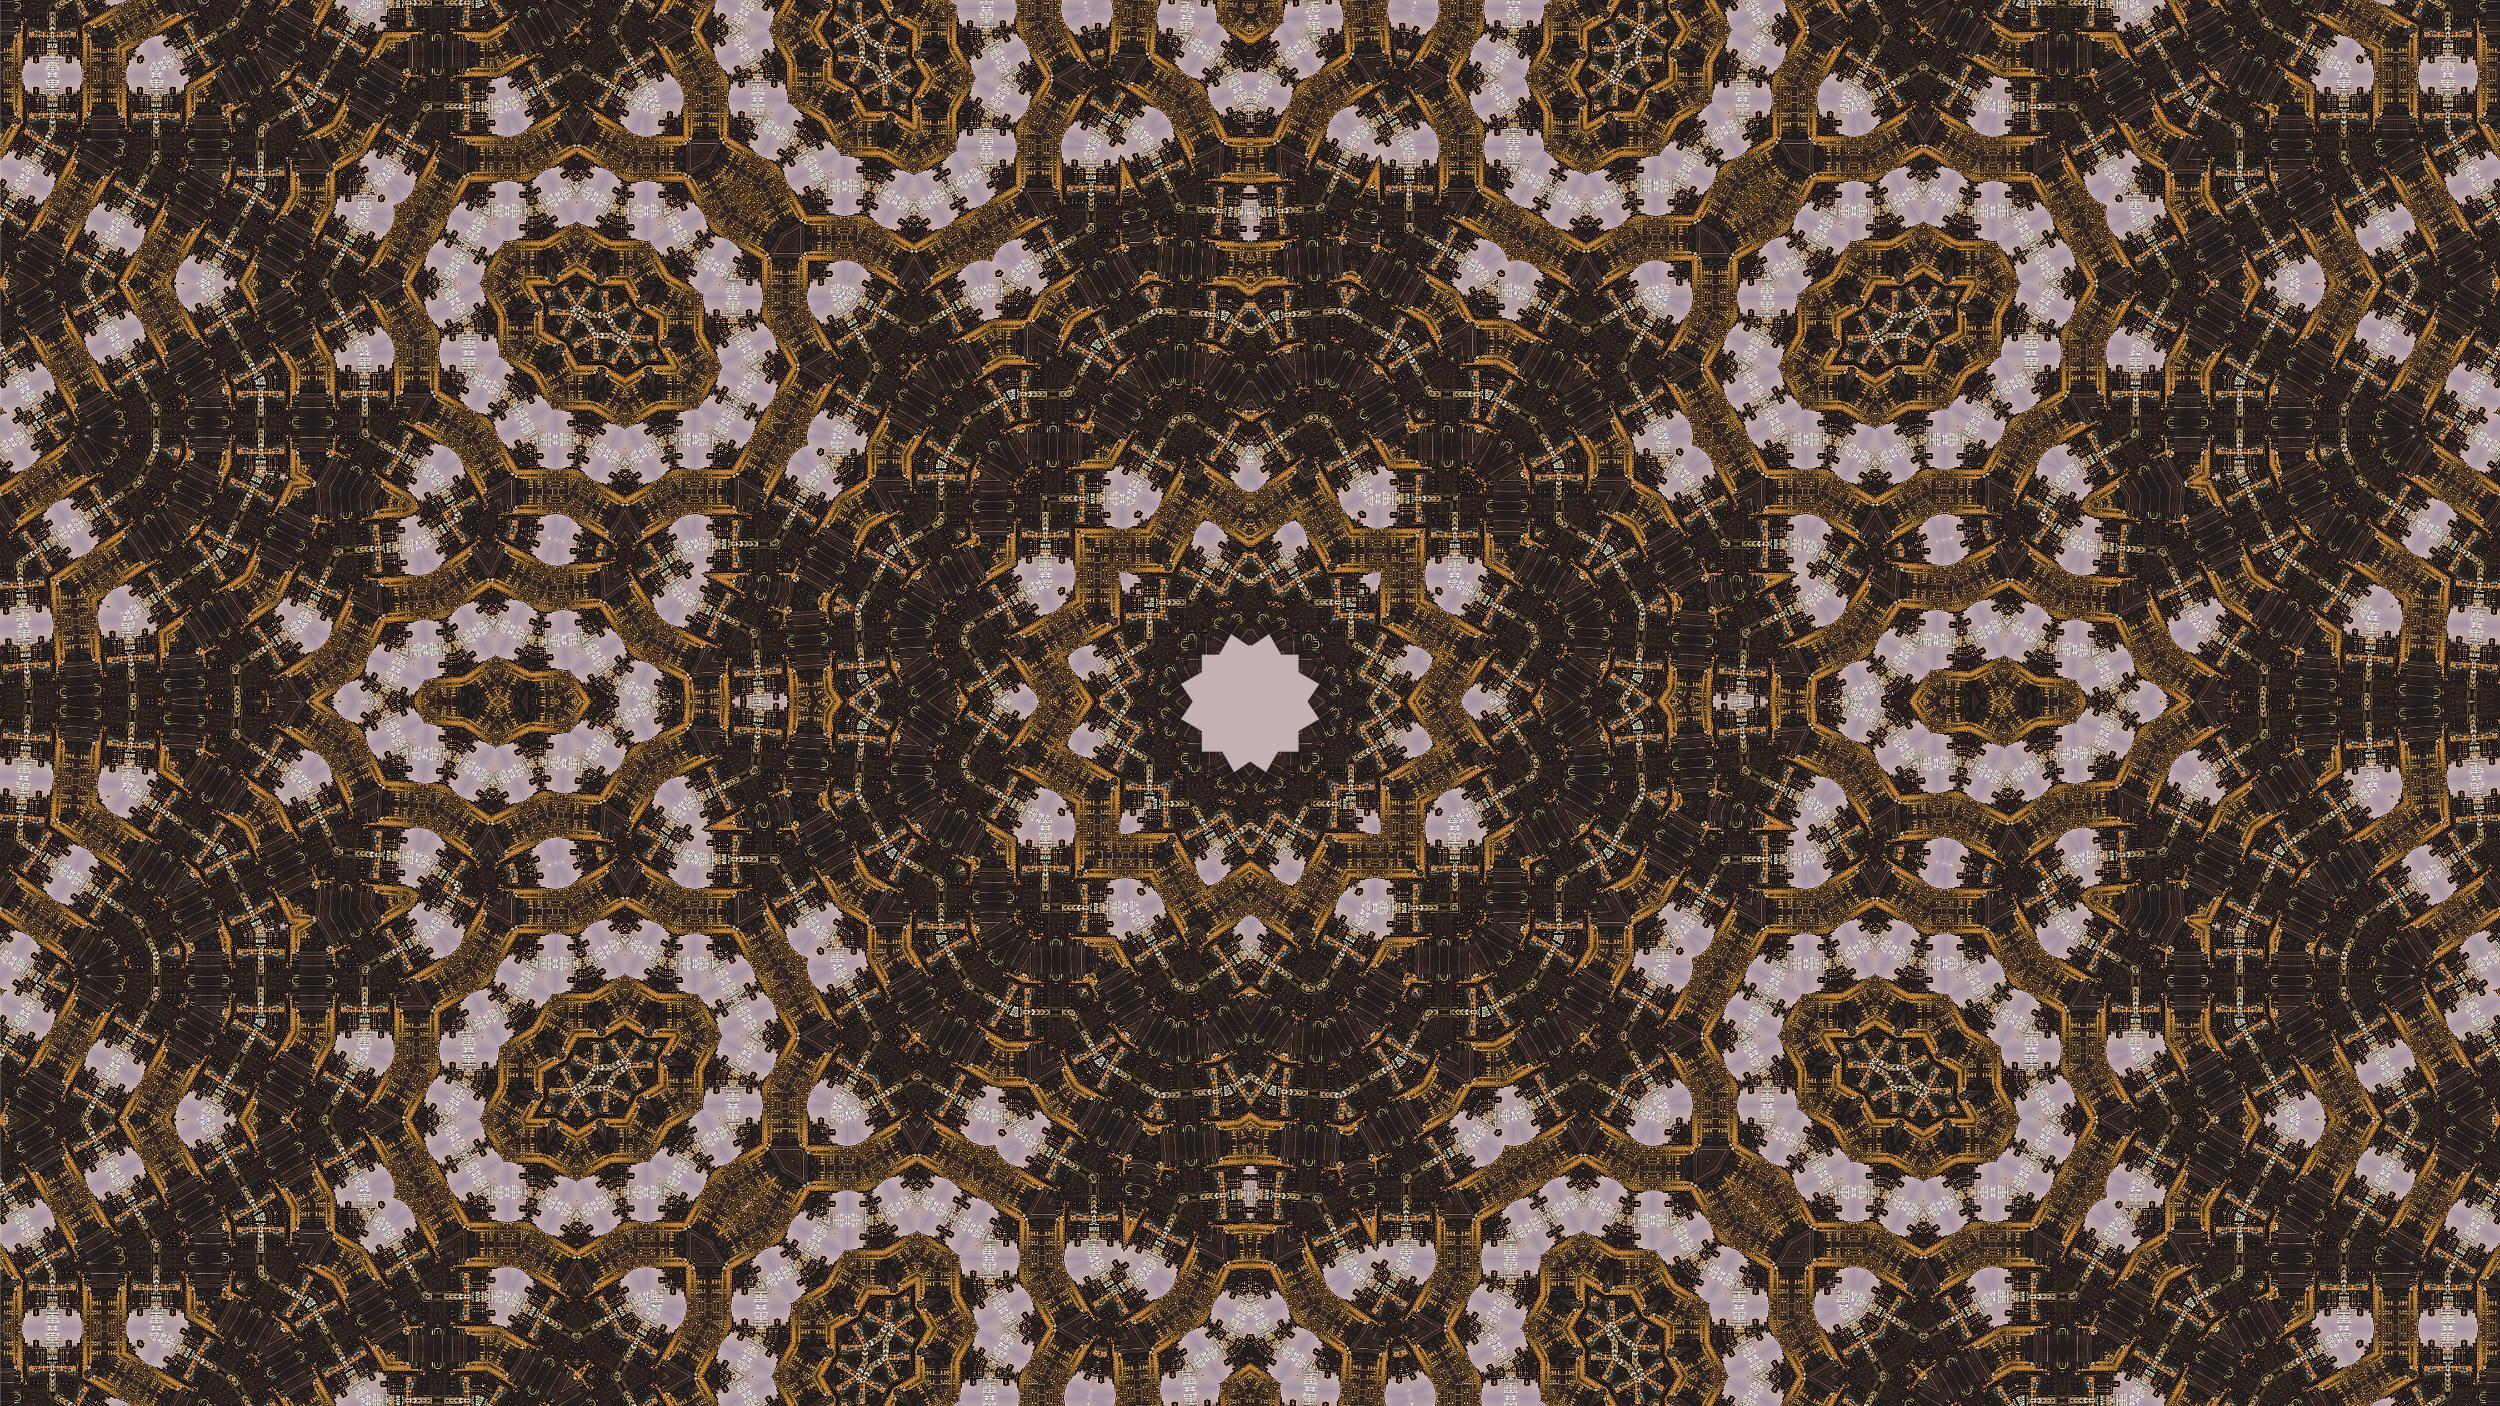 Pattern1-bigger44.jpg